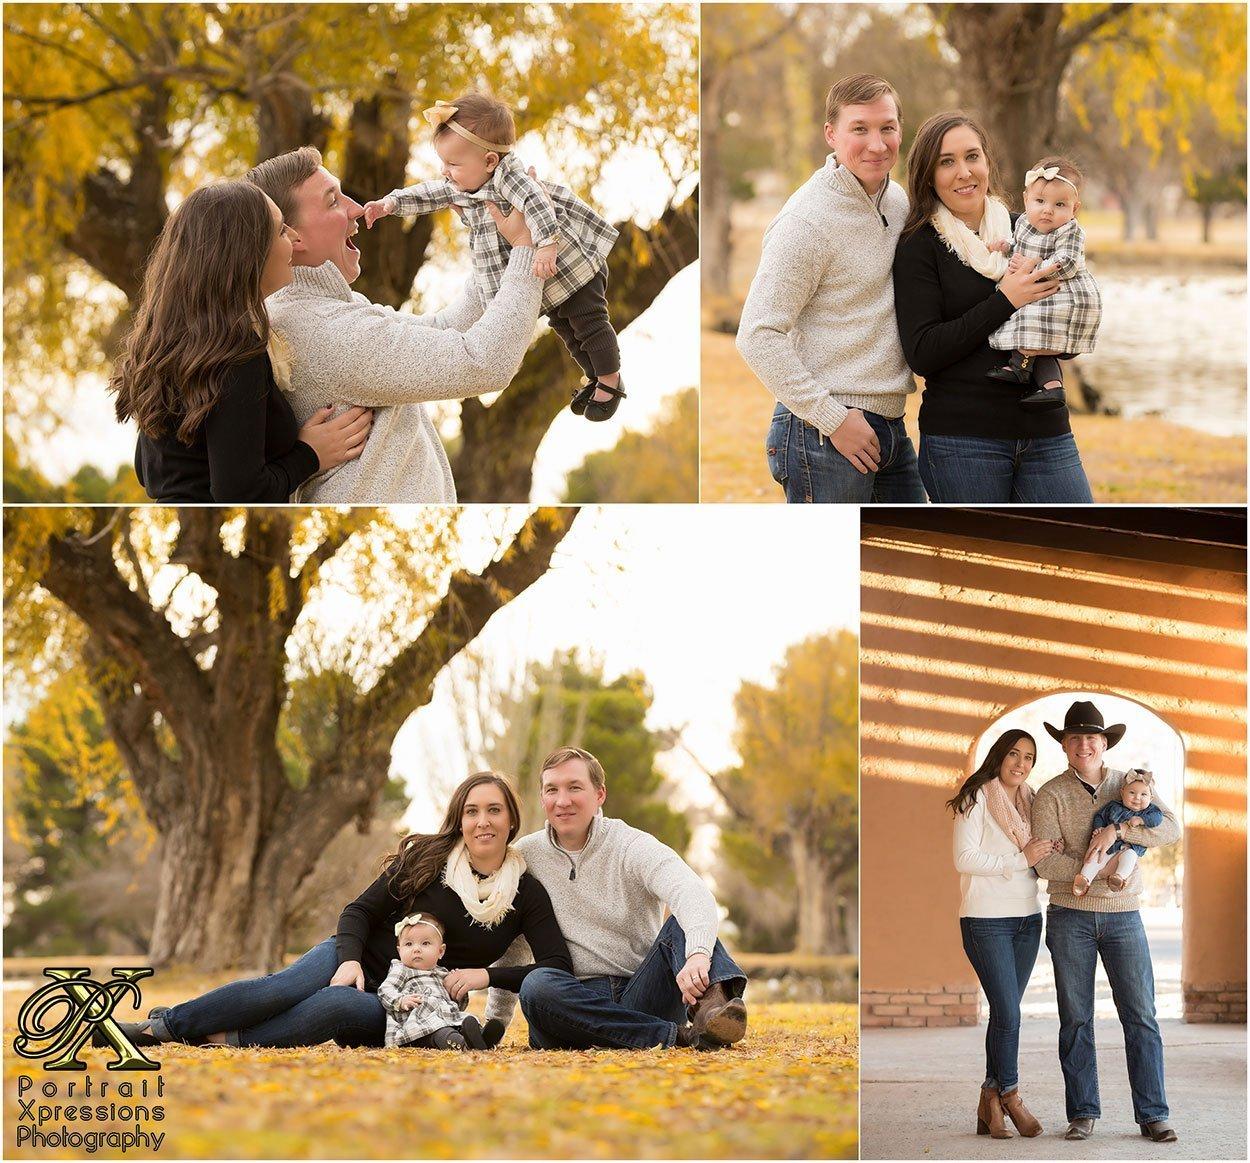 El Paso family portraits